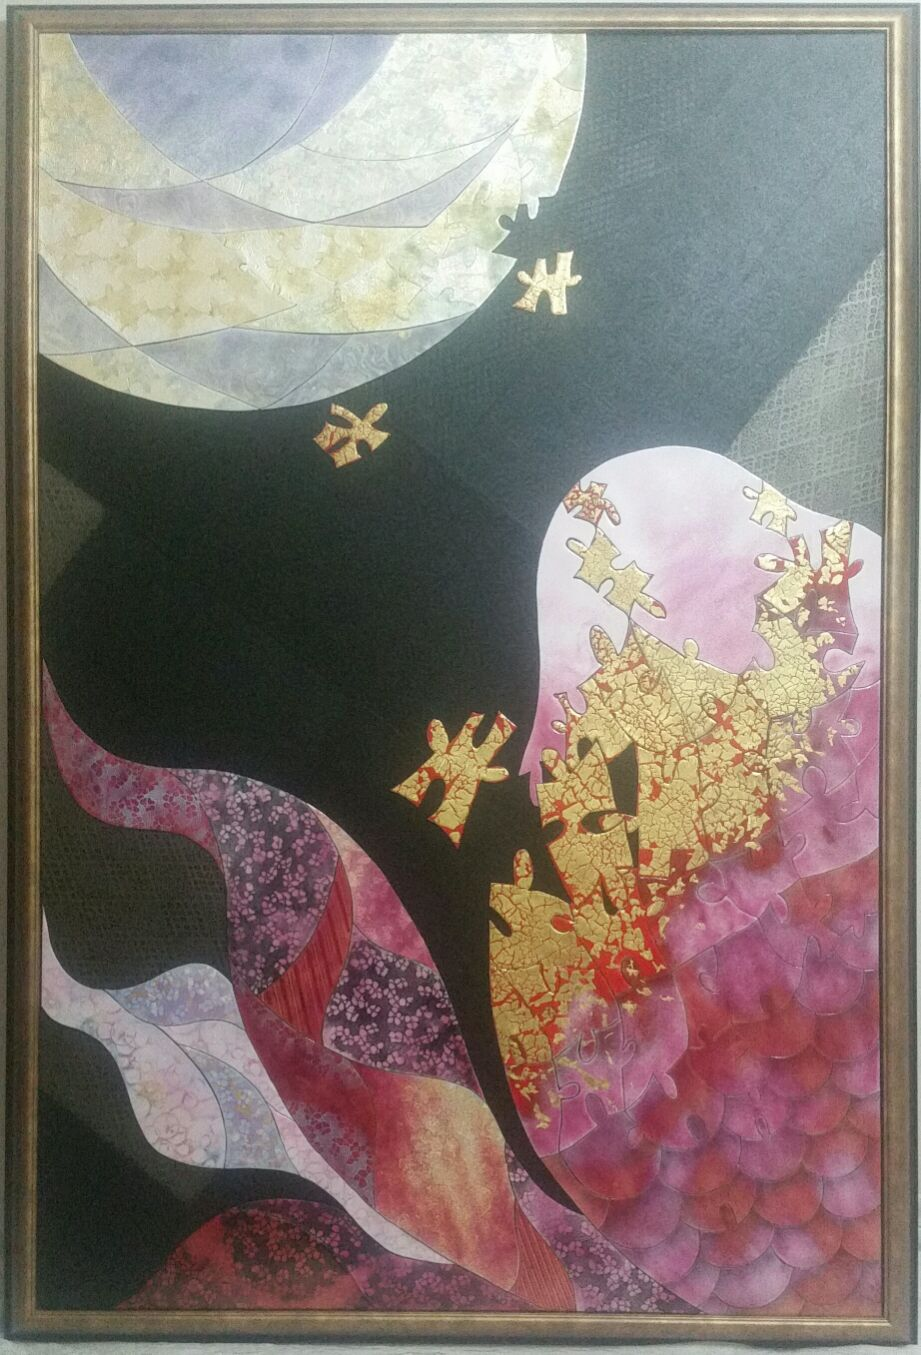 第56回 日本現代工芸美術展 作品 『心月へ泳ぐ』